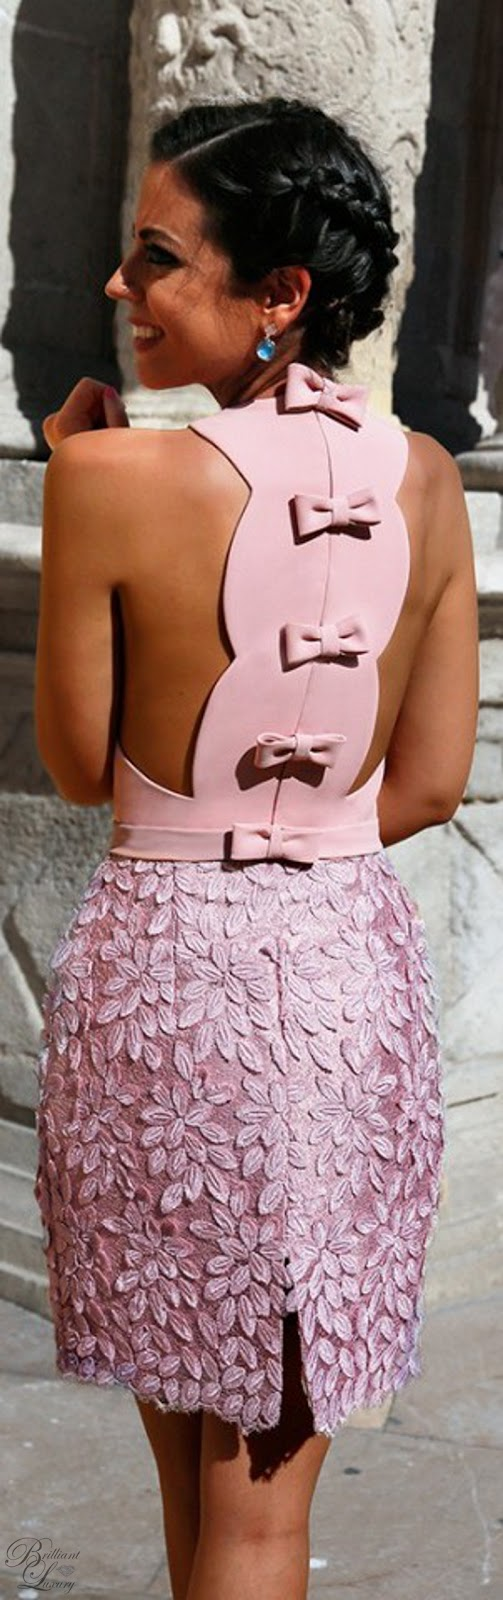 Brilliant Luxury ♦ Silvia Navarro pink Petalo dress with bow details